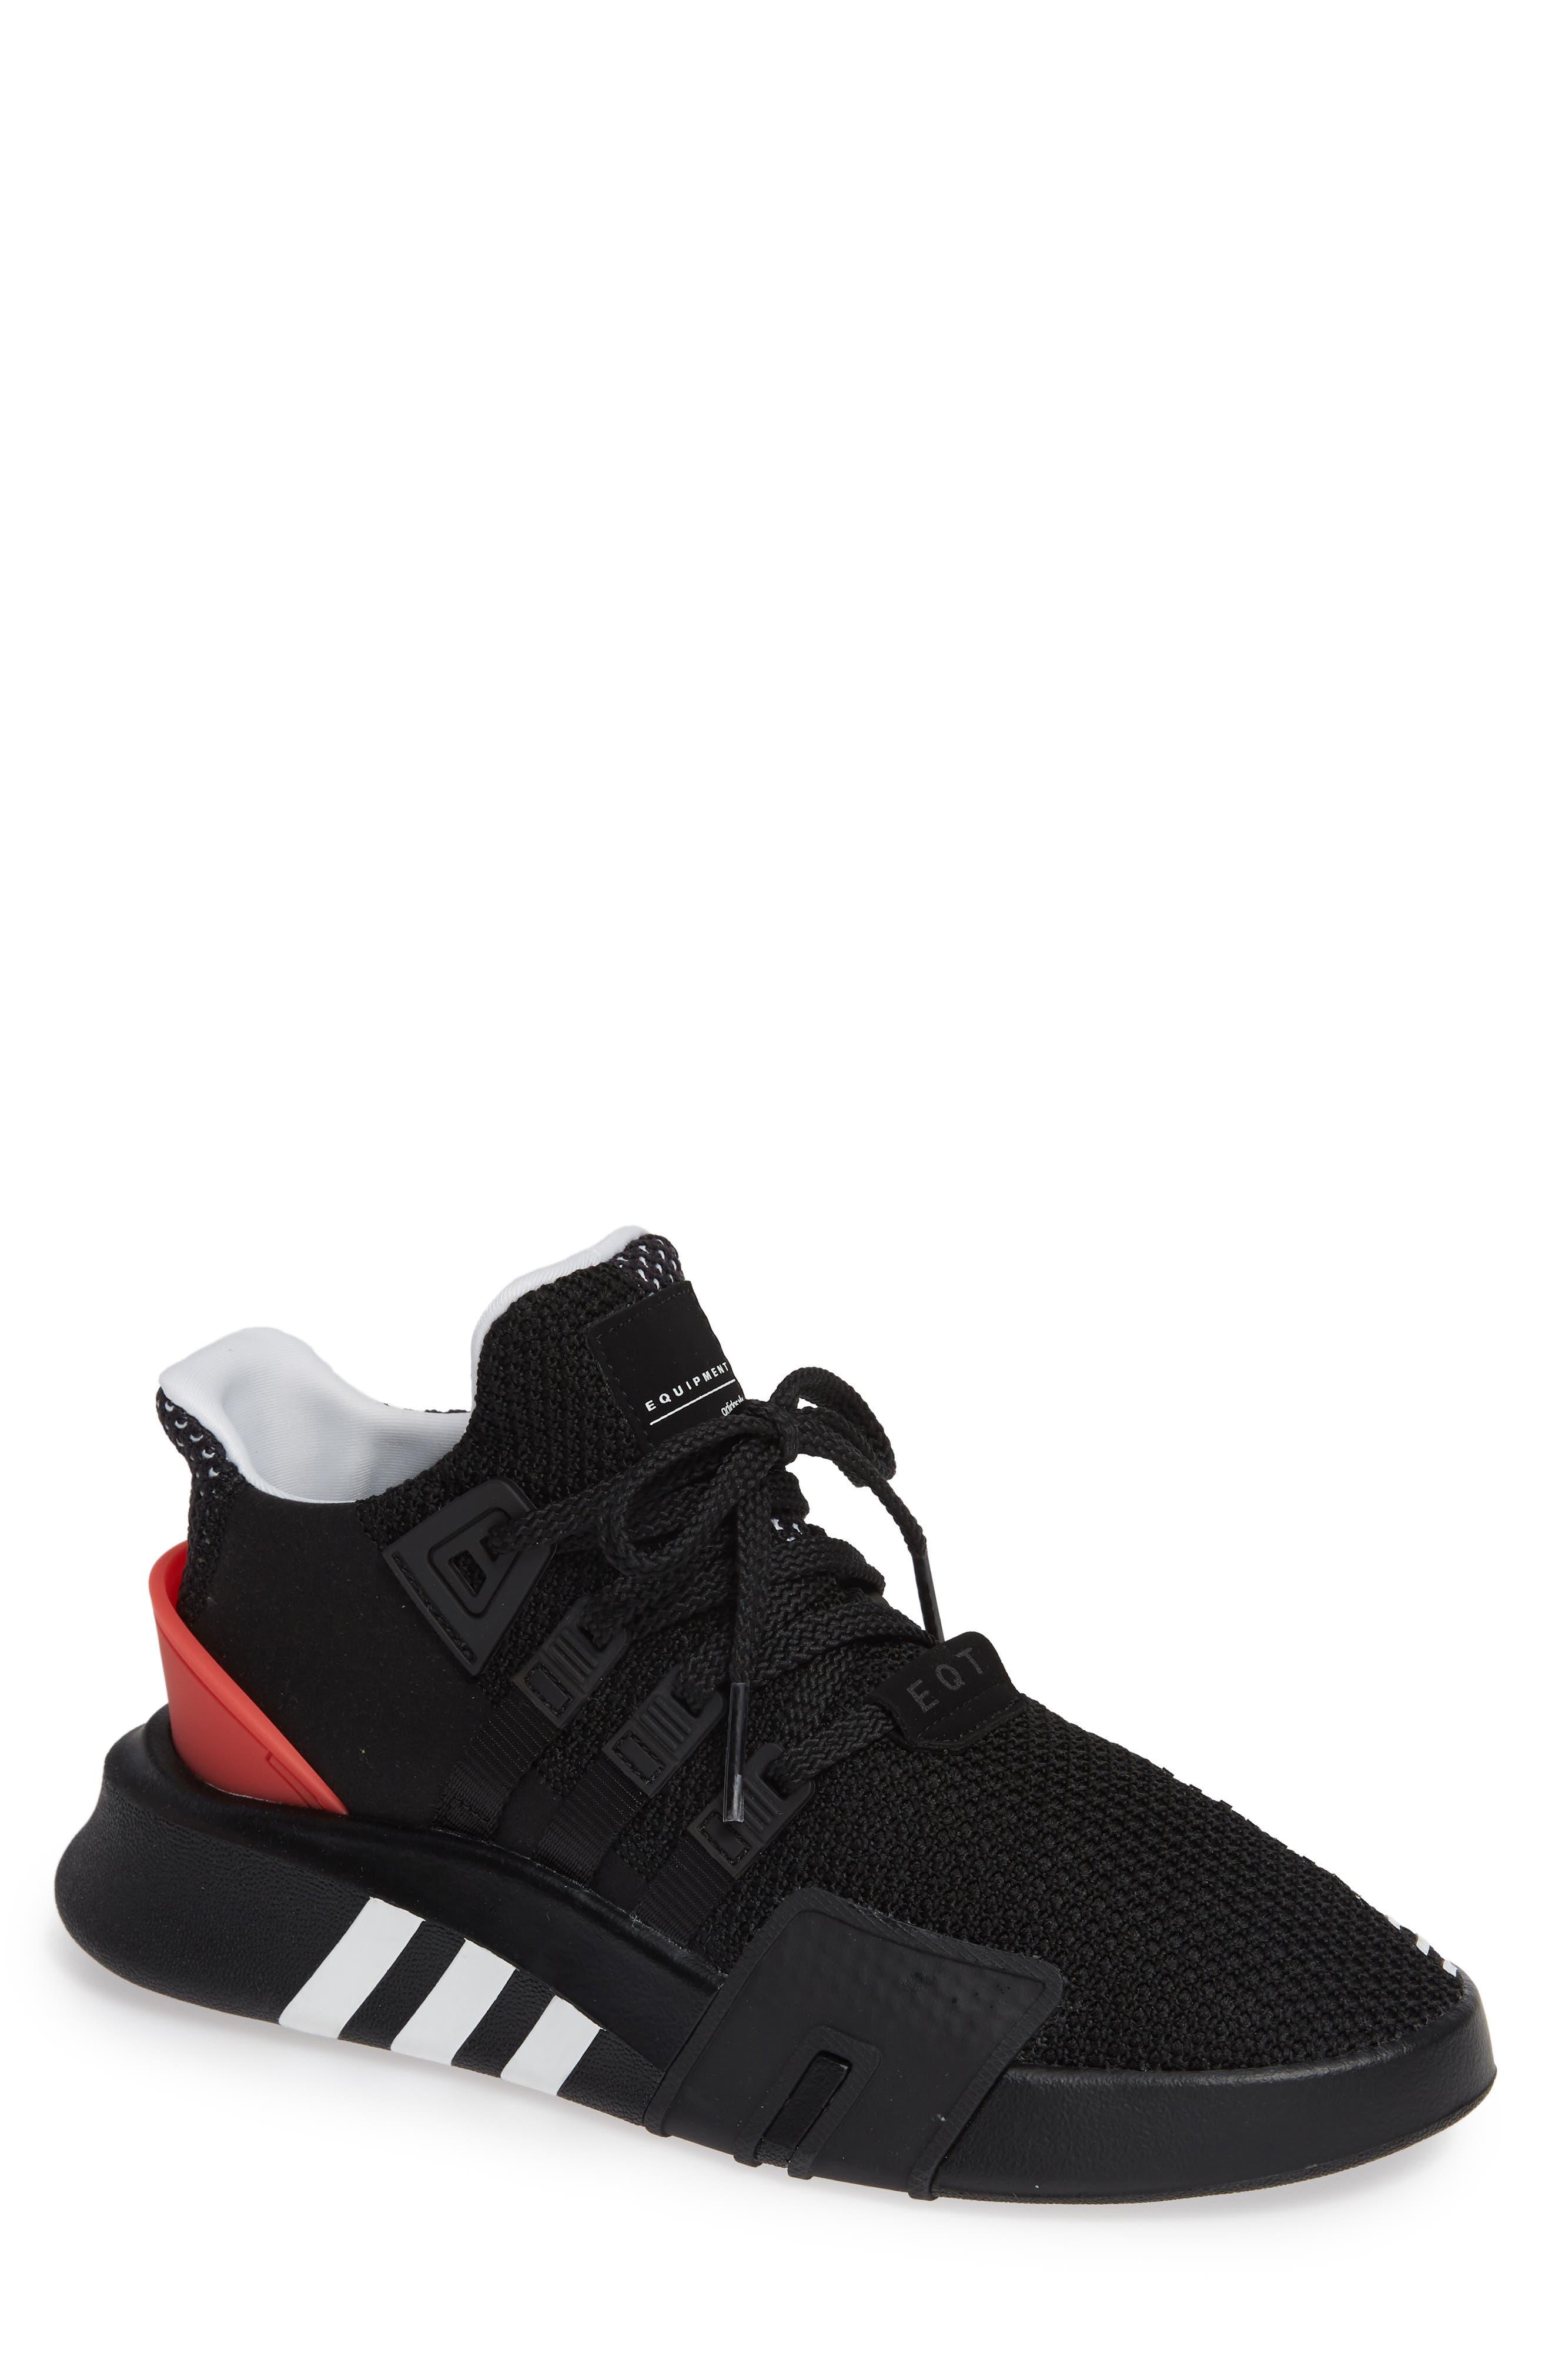 EQT Basketball ADV Sneaker,                             Main thumbnail 1, color,                             Black/ White/ Hi-Res Red